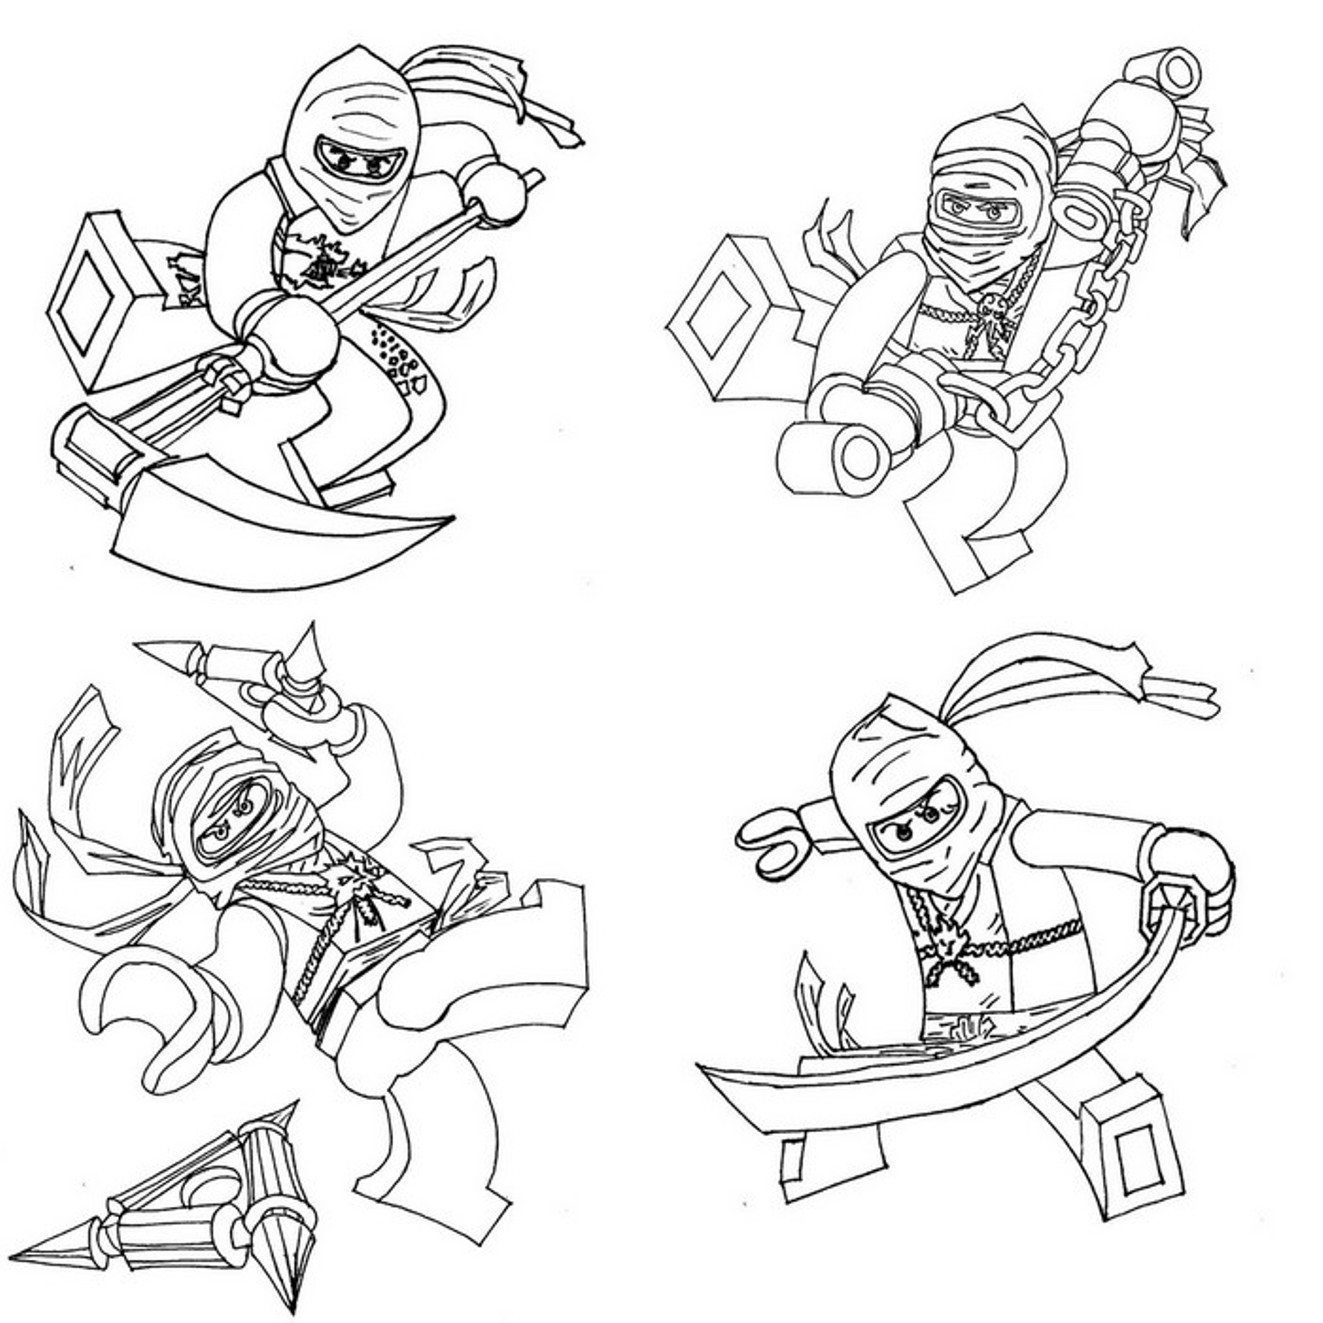 Ninjago Cole Ausmalbilder  Ausmalbilder ninjago kostenlos Malvorlagen zum